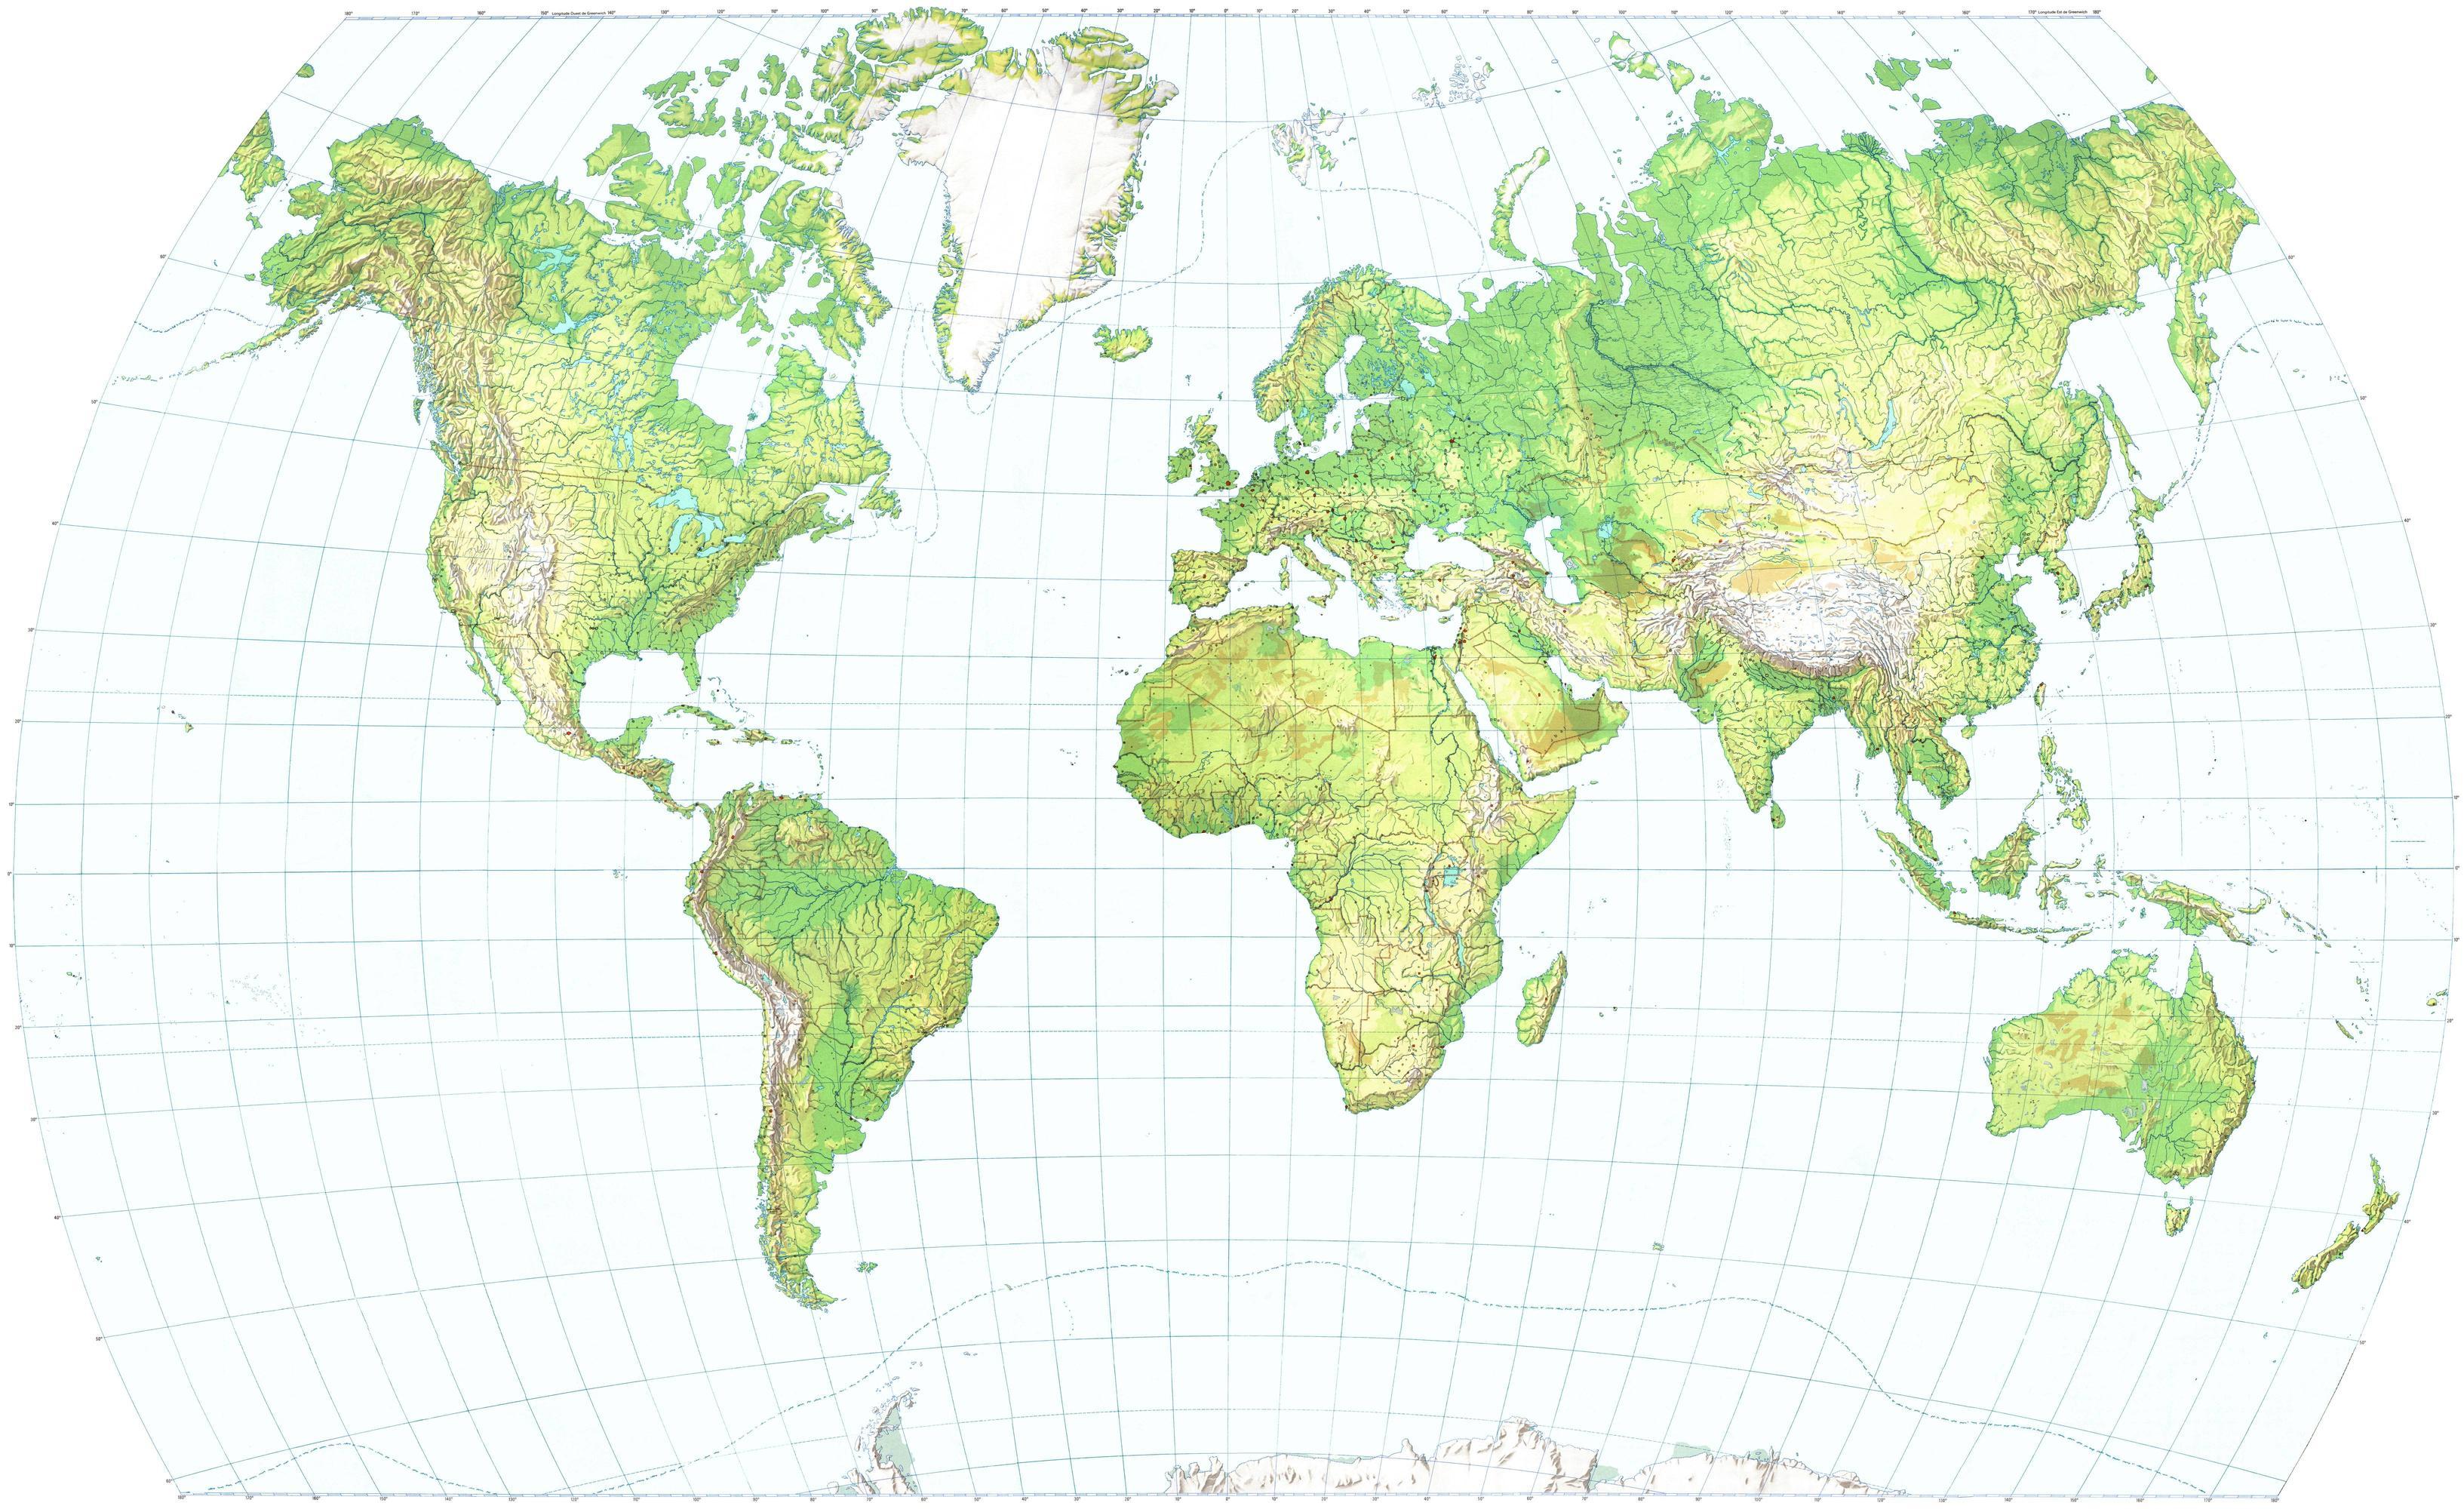 World map wallpaper high resolution wallpapersafari world map wallpapers high resolution 3266x2000 gumiabroncs Images